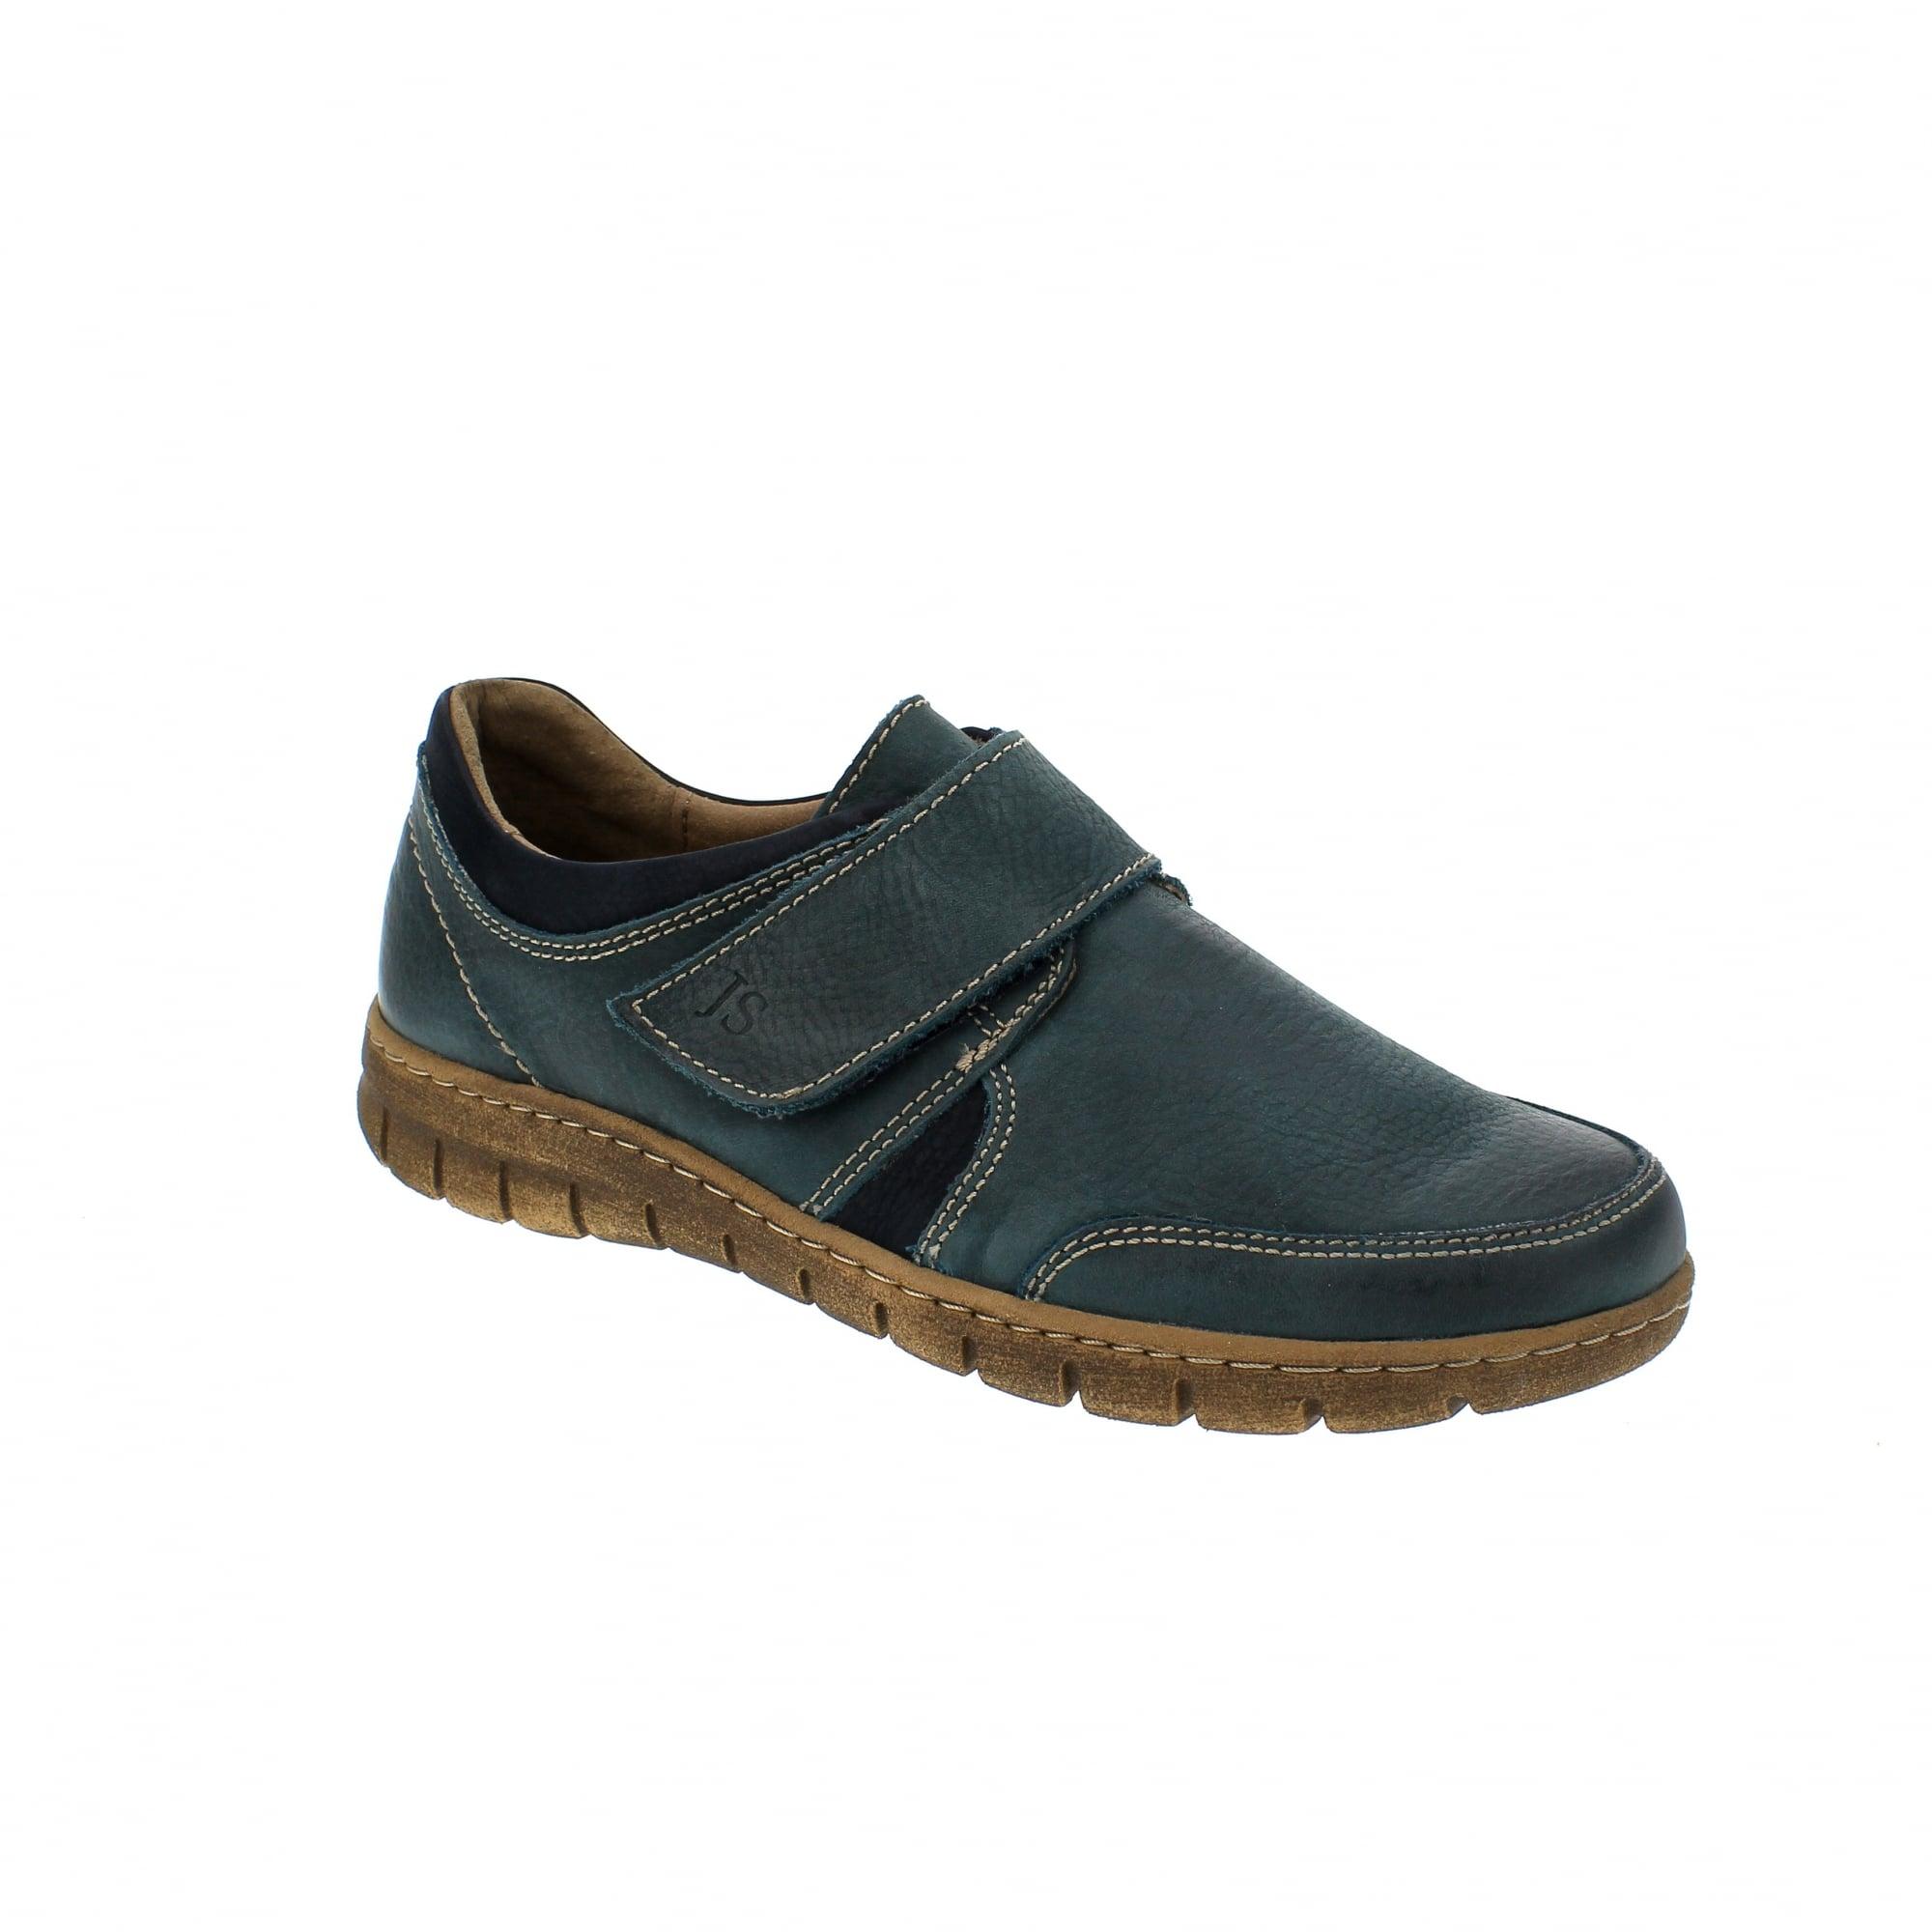 24489c0e Josef Seibel Steffi 33 Teal Womens Velcro Shoes   Rogerson Shoes